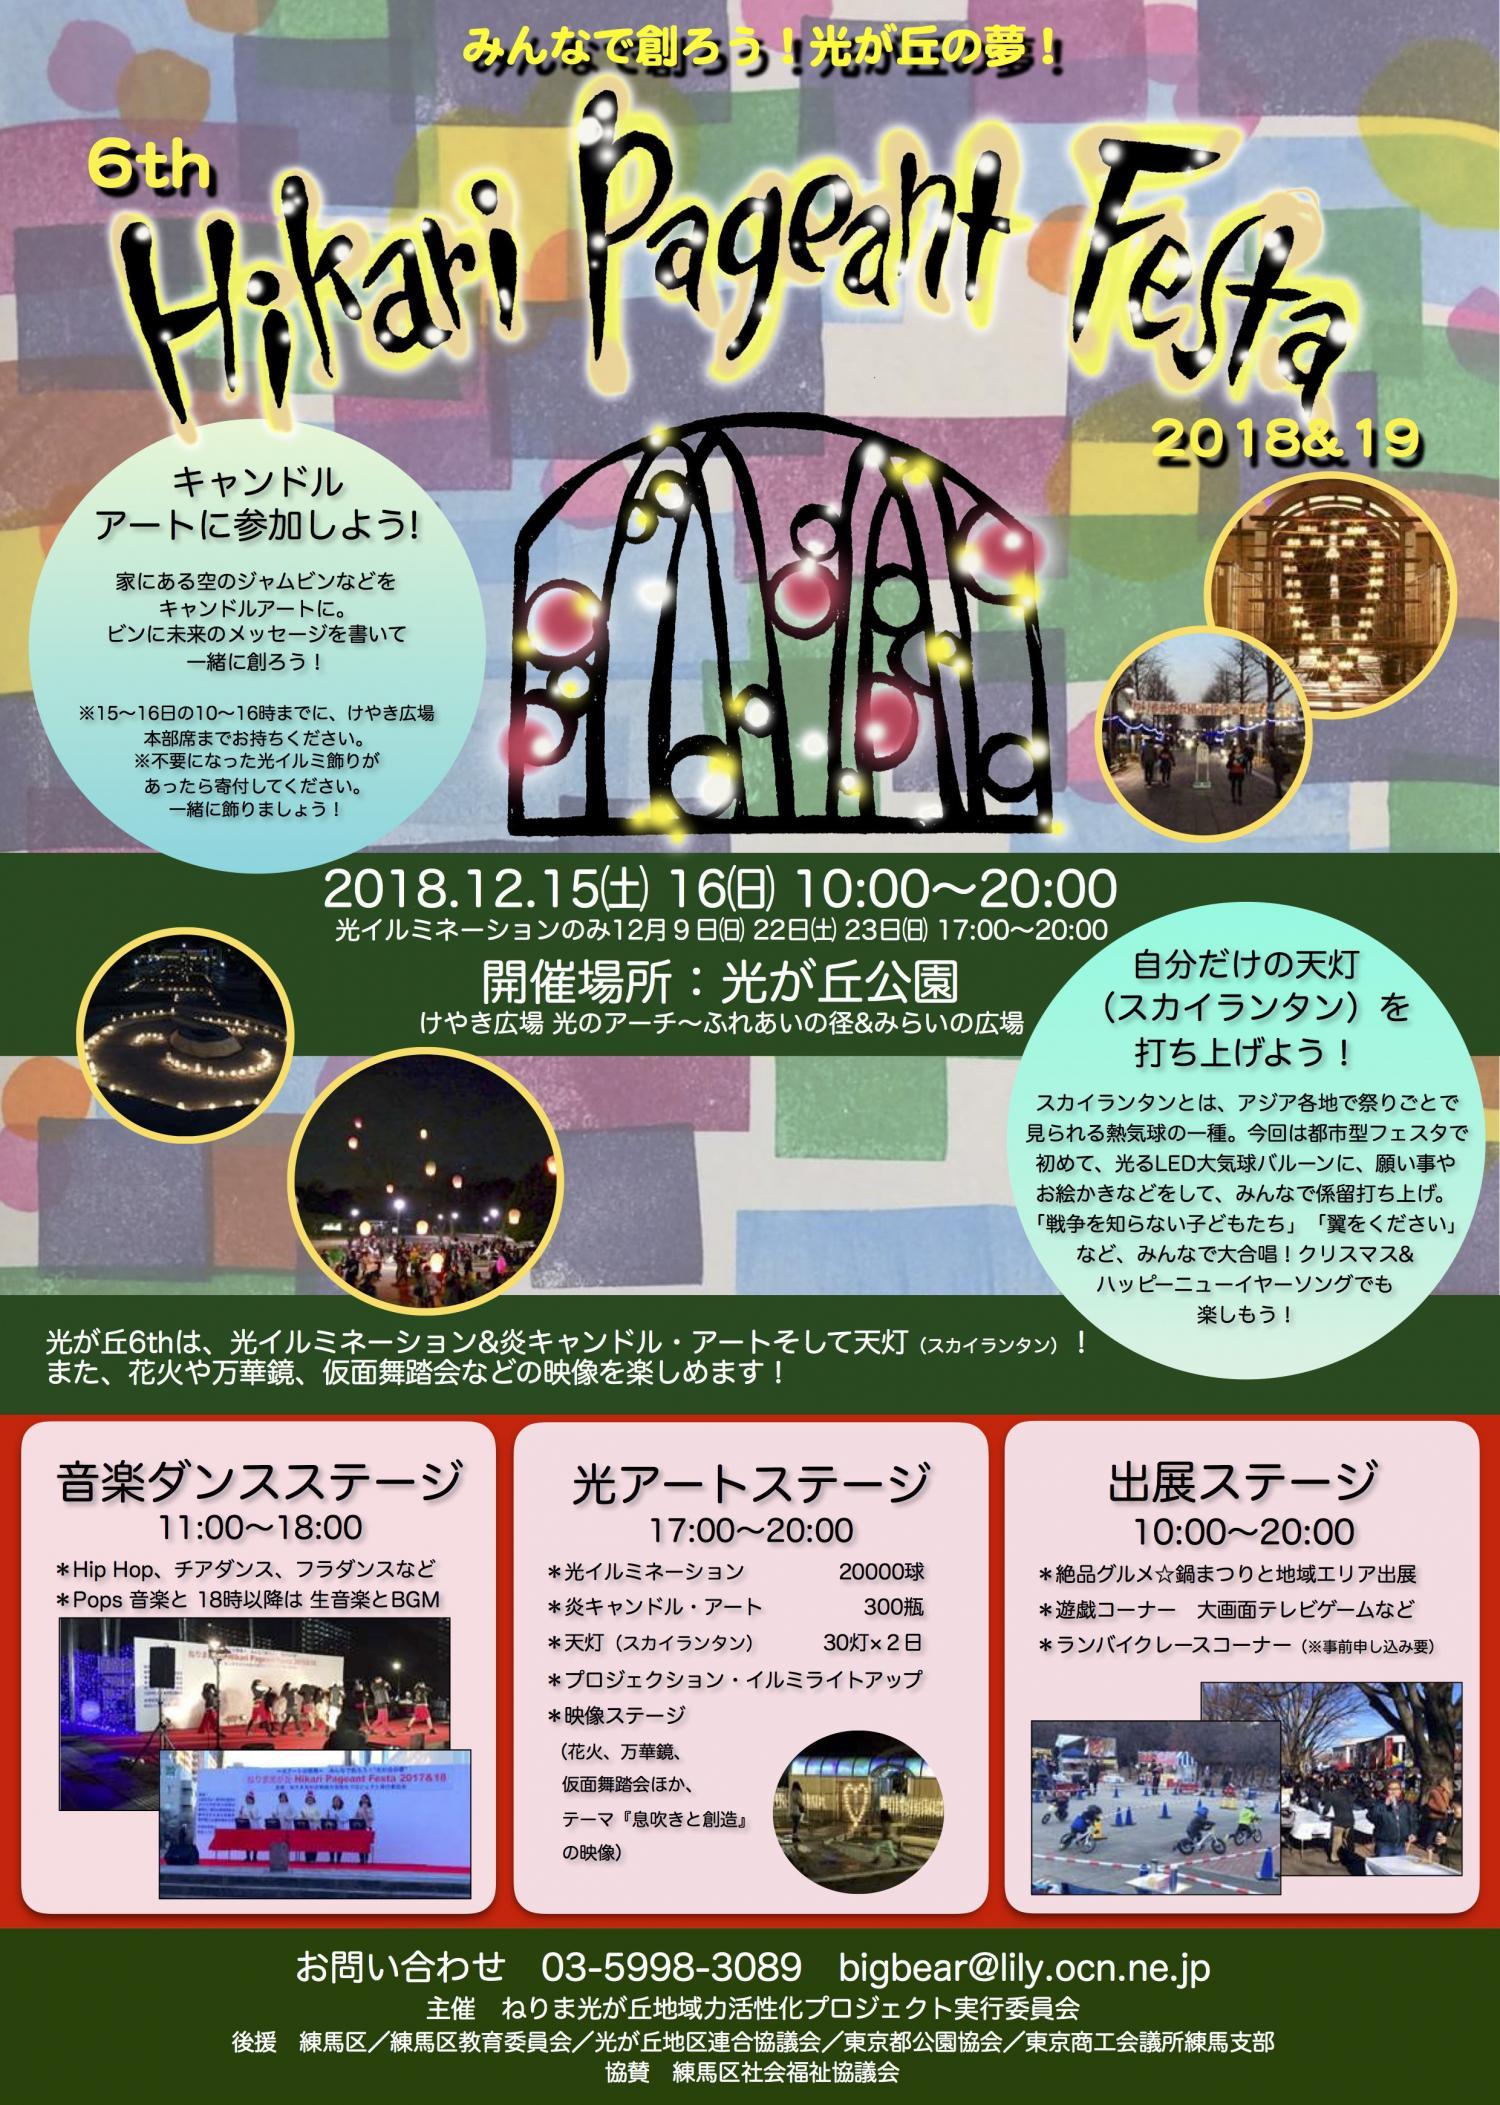 Hikari Pageant Festa 2018 이미지